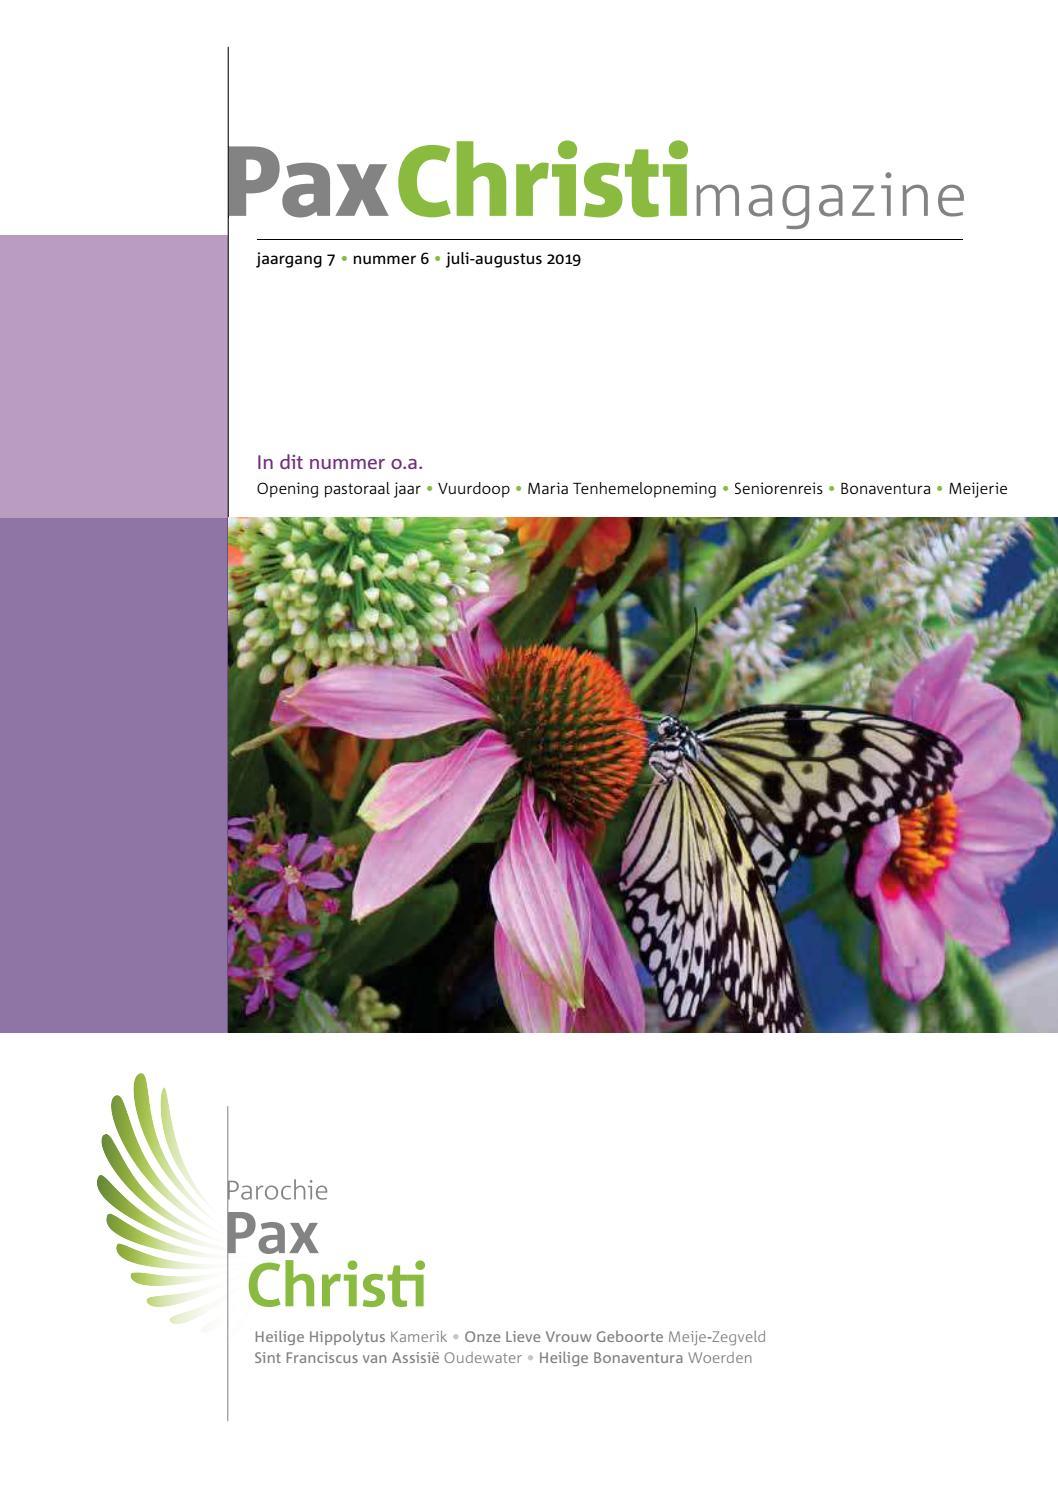 190704 Pax Christi Parochiemagazine By Peter Zijdemans Issuu